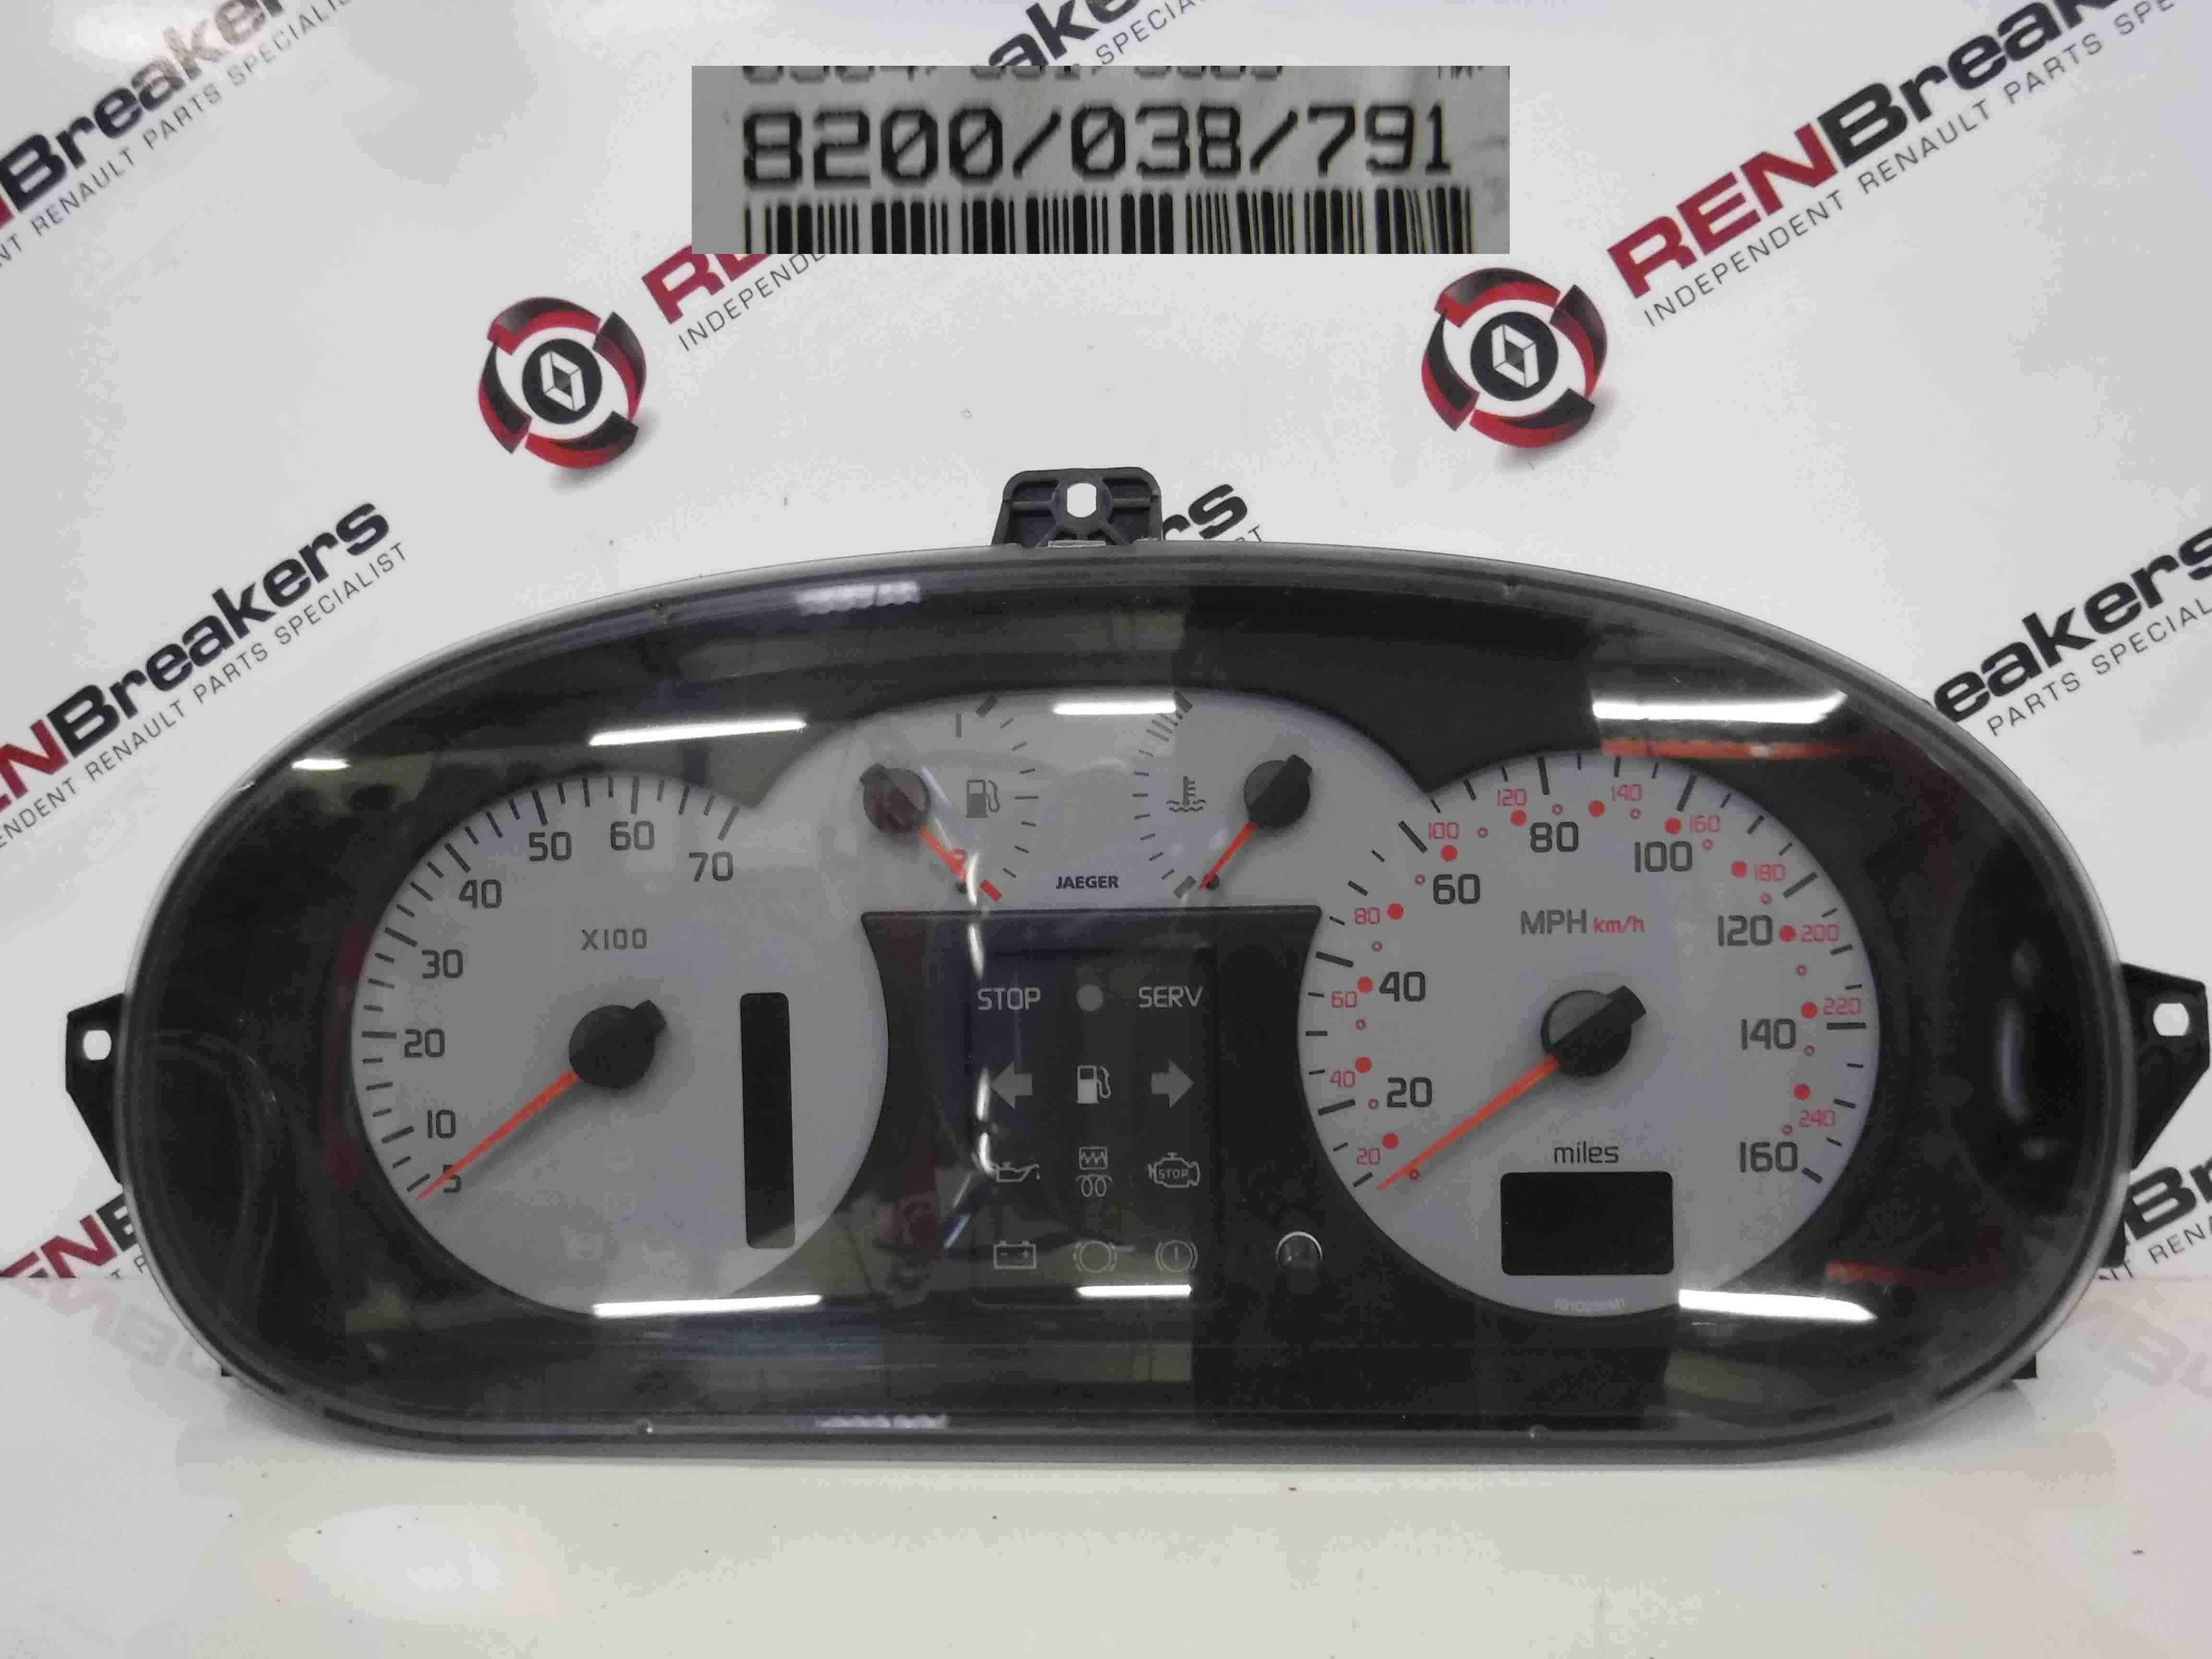 Renault Scenic 1999-2003 Instrument Panel Dials Gauges Clocks 8200038791